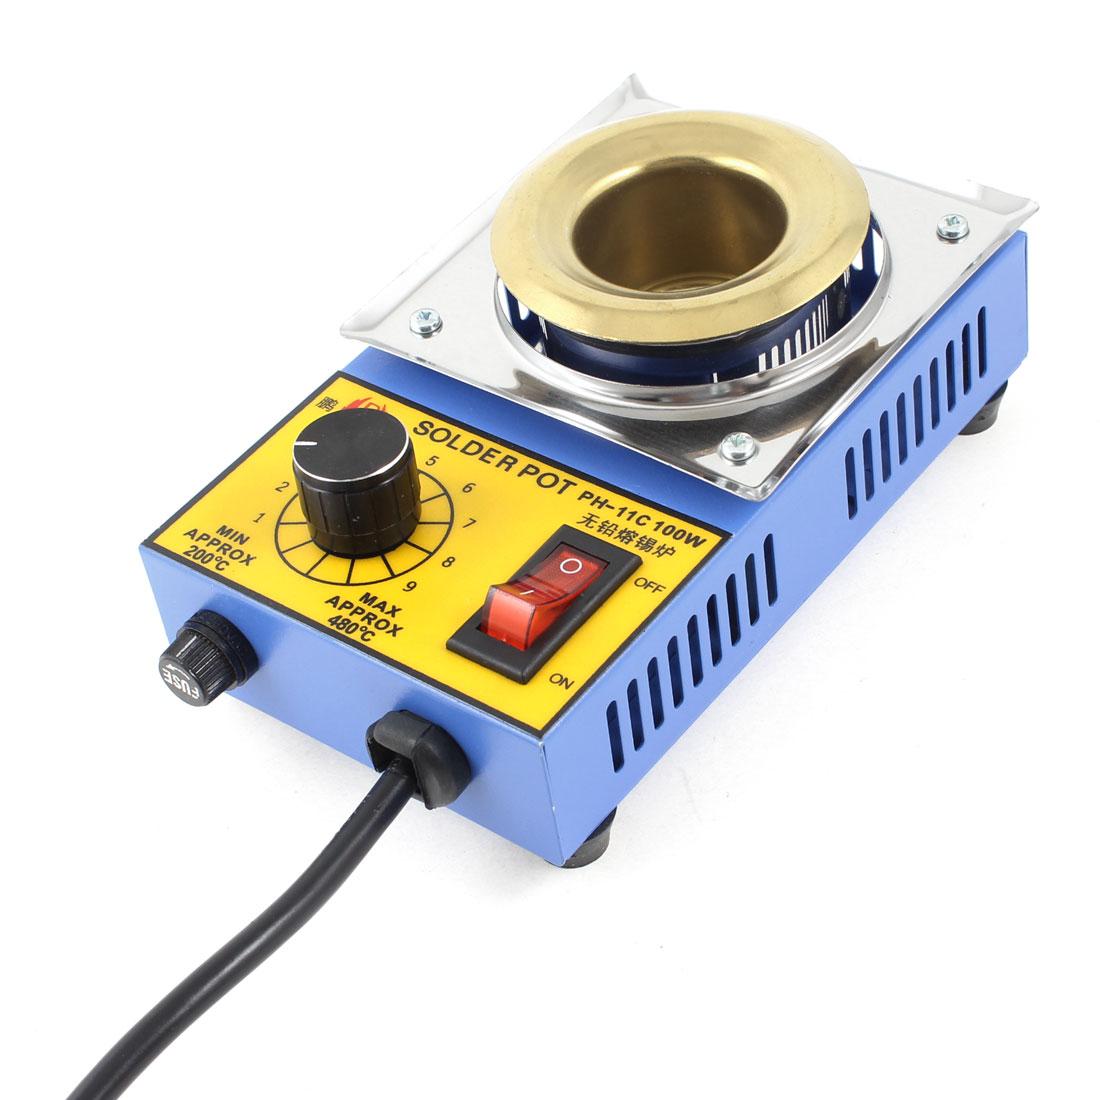 AU Plug 220VAC 100W Temperature Adjustable Stainless Steel Solder Pot